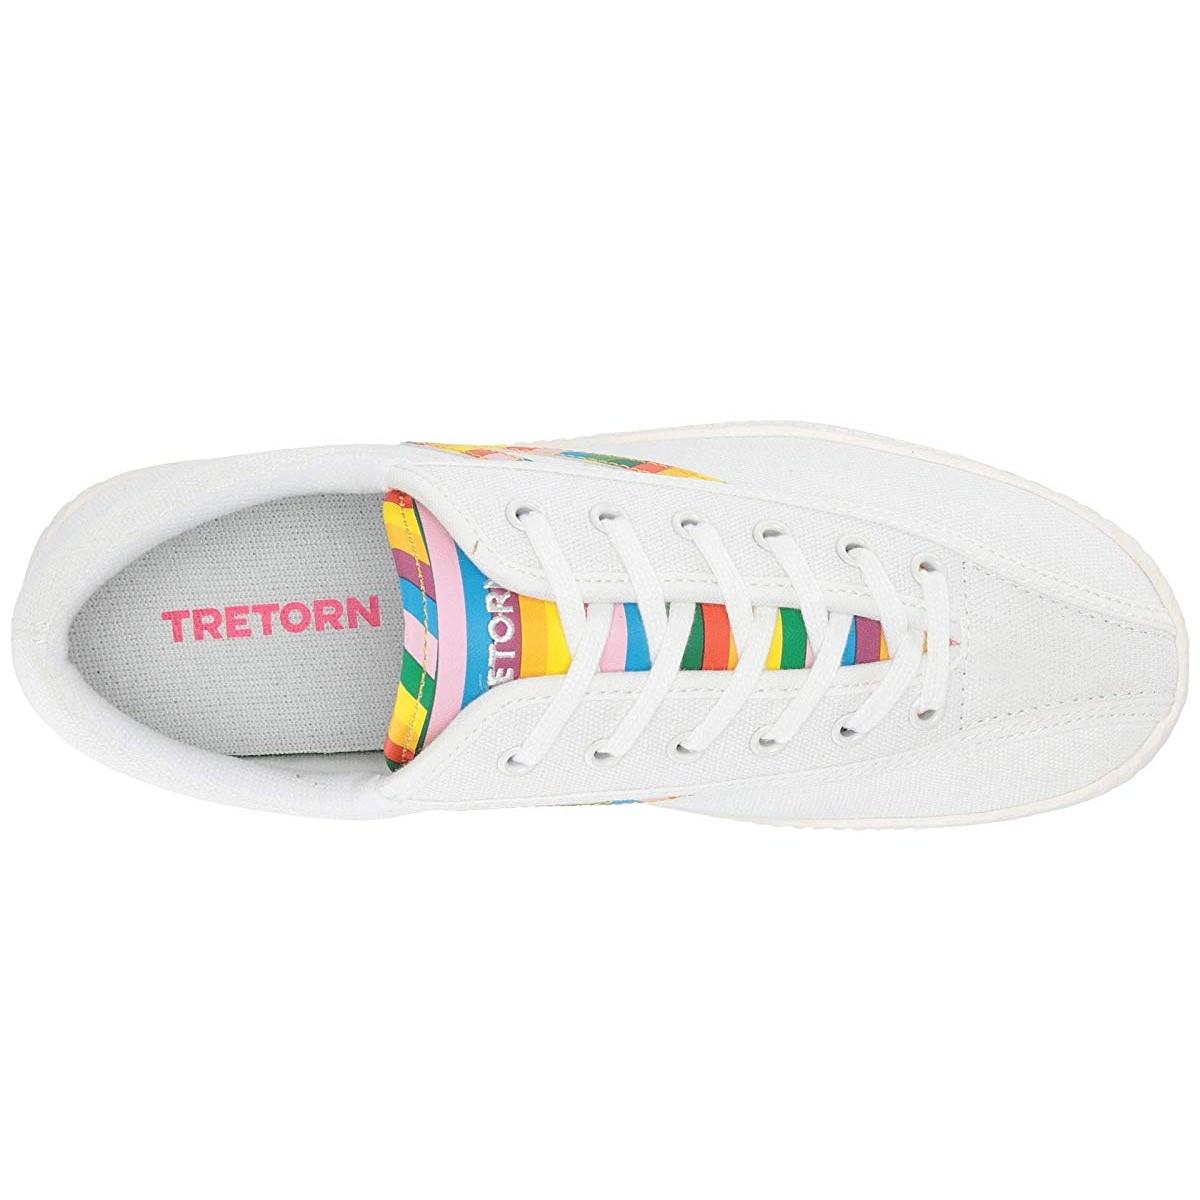 Кроссовки Tretorn Nylite 28 Plus Vintage White/Vintage White/Classic Multi - Оригинал, фото 1